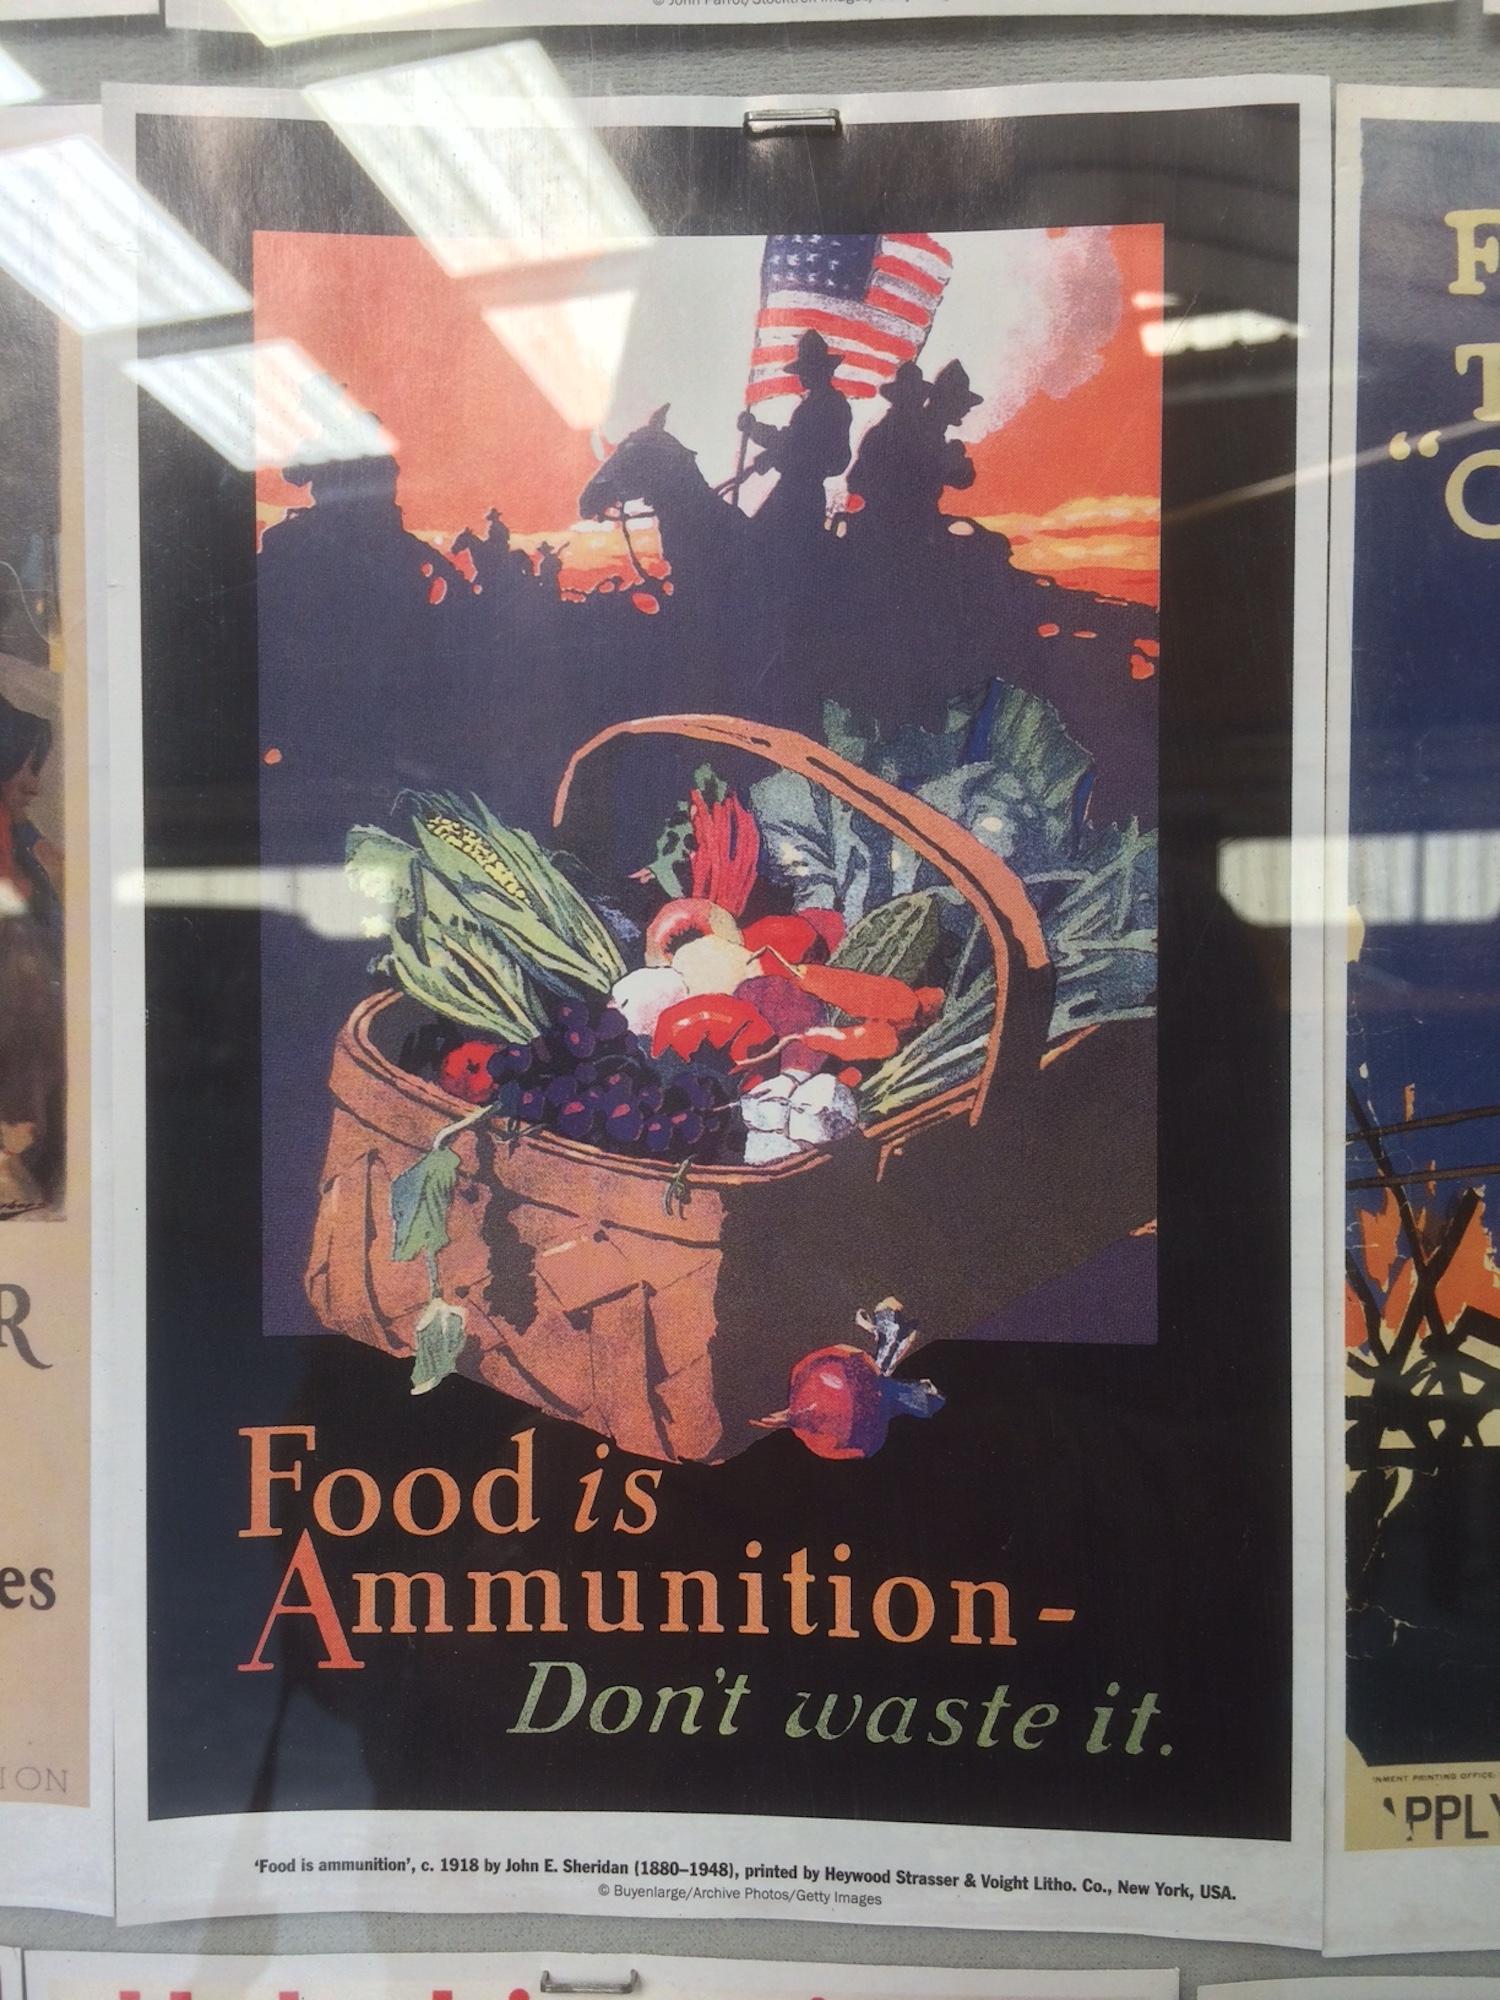 2017-august-food-ammunition-war-humanKINDER.JPG